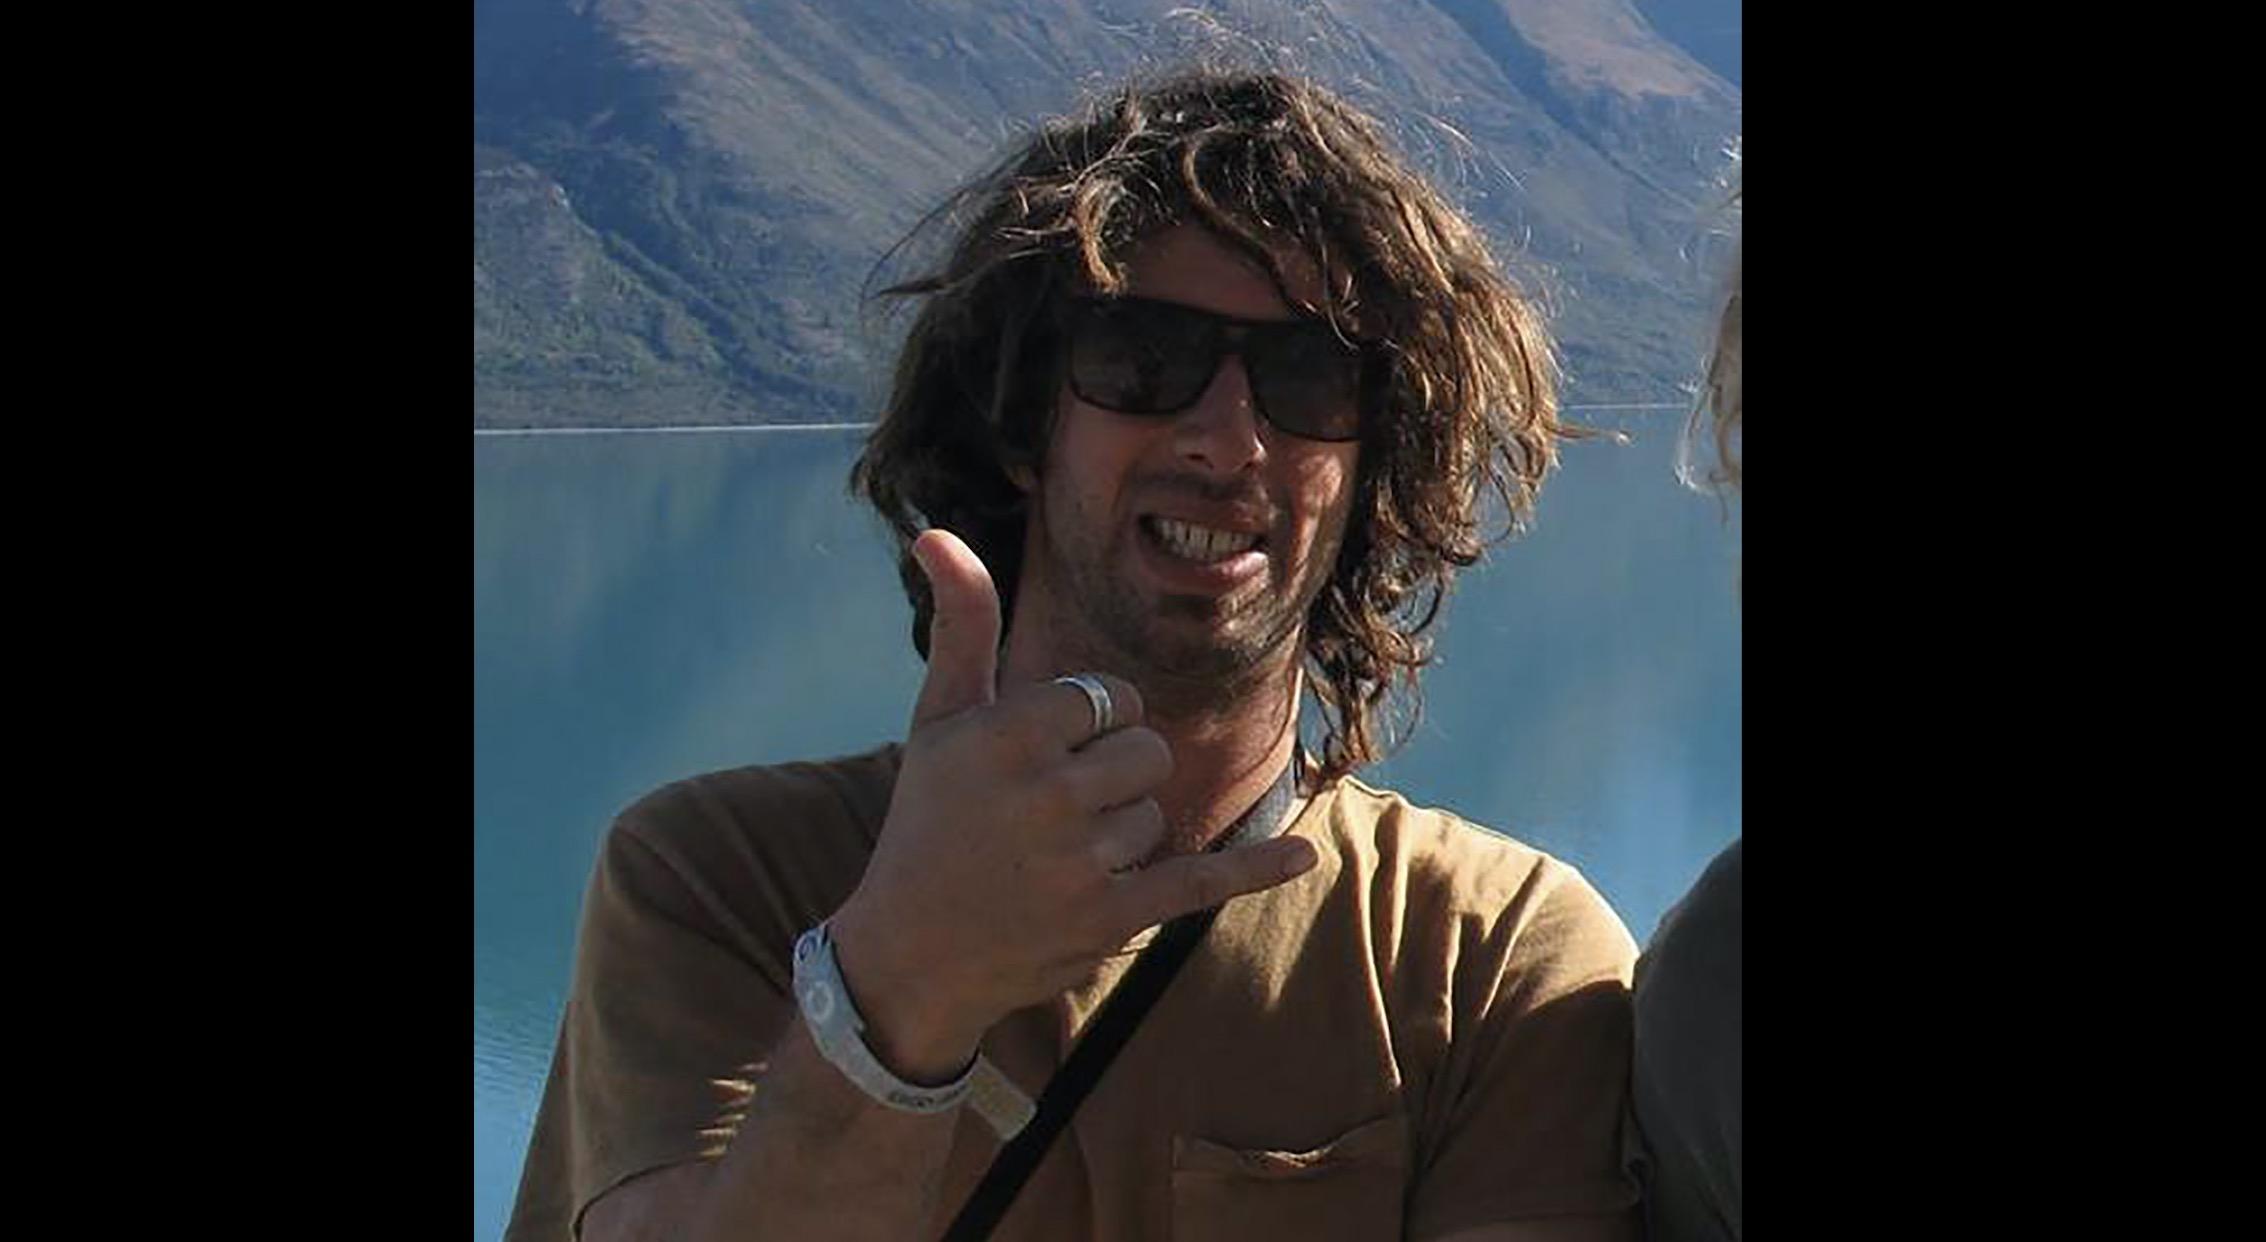 New Zealand Man Behind Bars Over Australian Surfer's Death